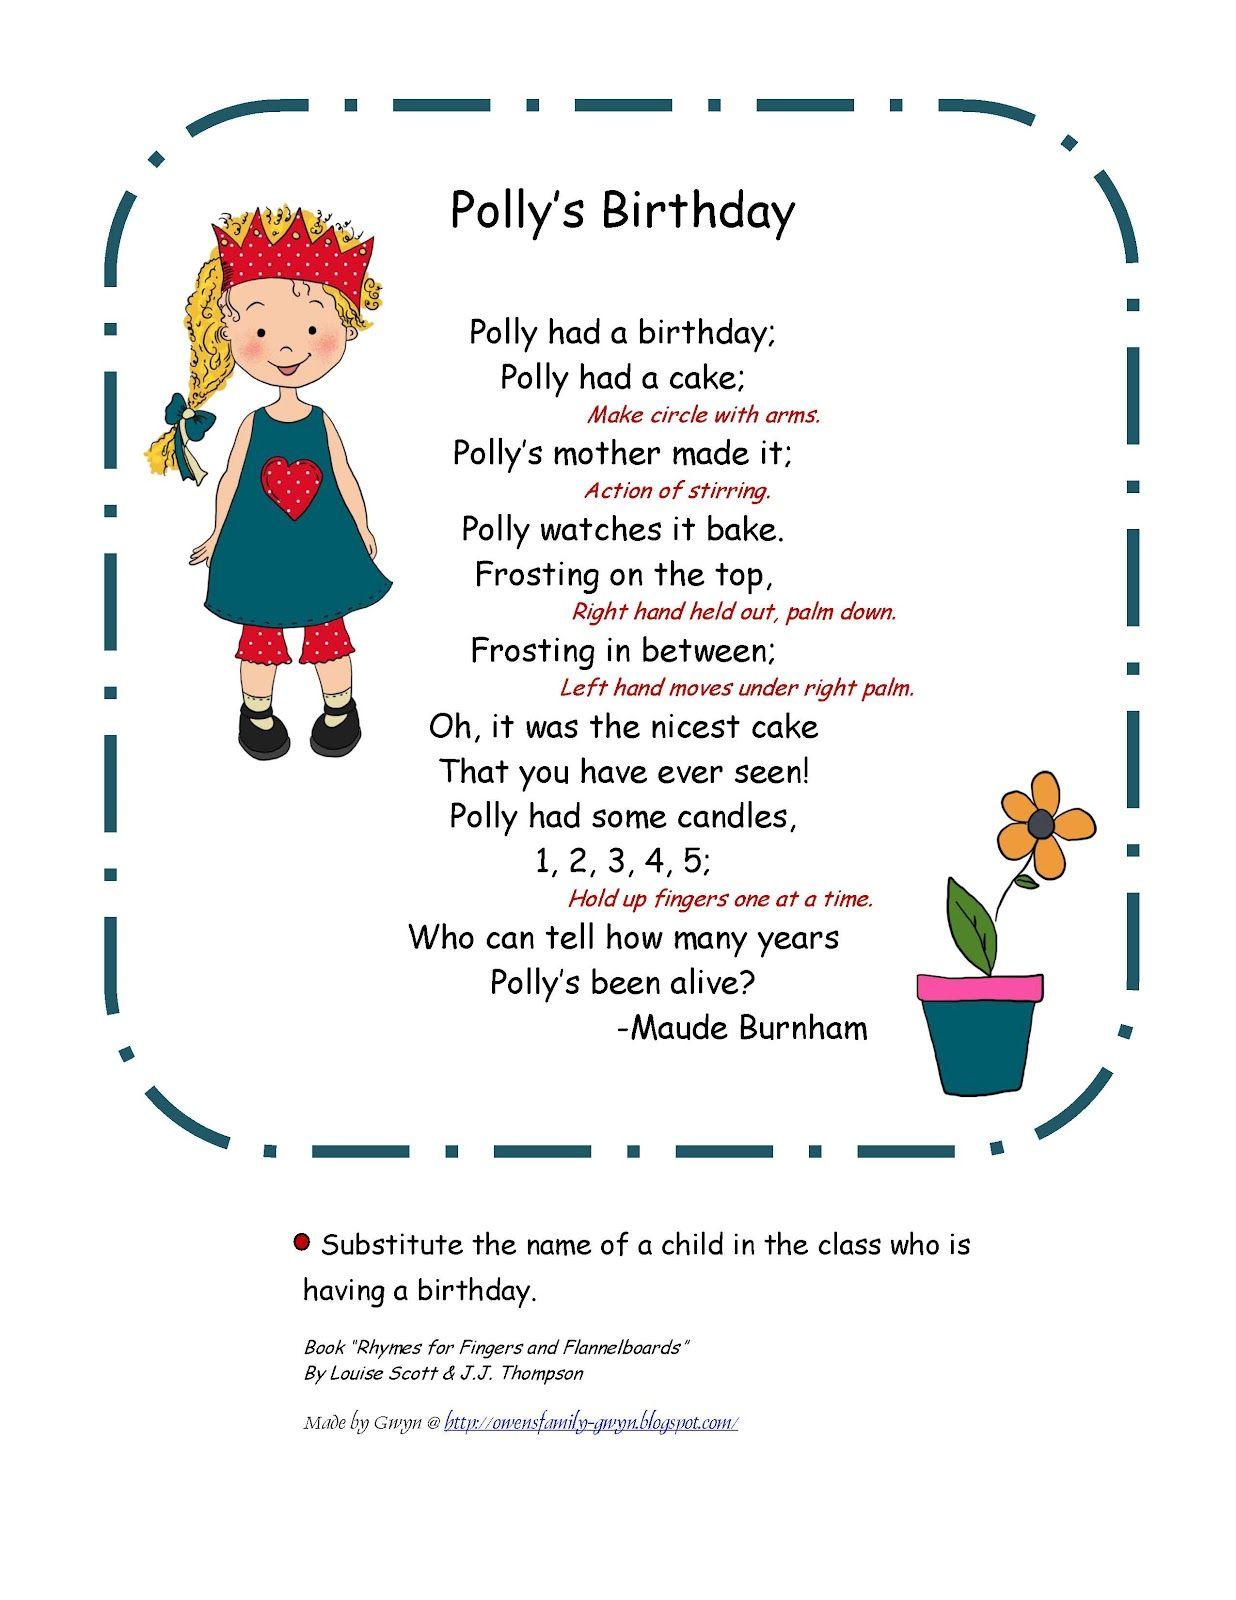 preschool printables polly 39 s birthday poem misc kindergarten poems birthday poems. Black Bedroom Furniture Sets. Home Design Ideas